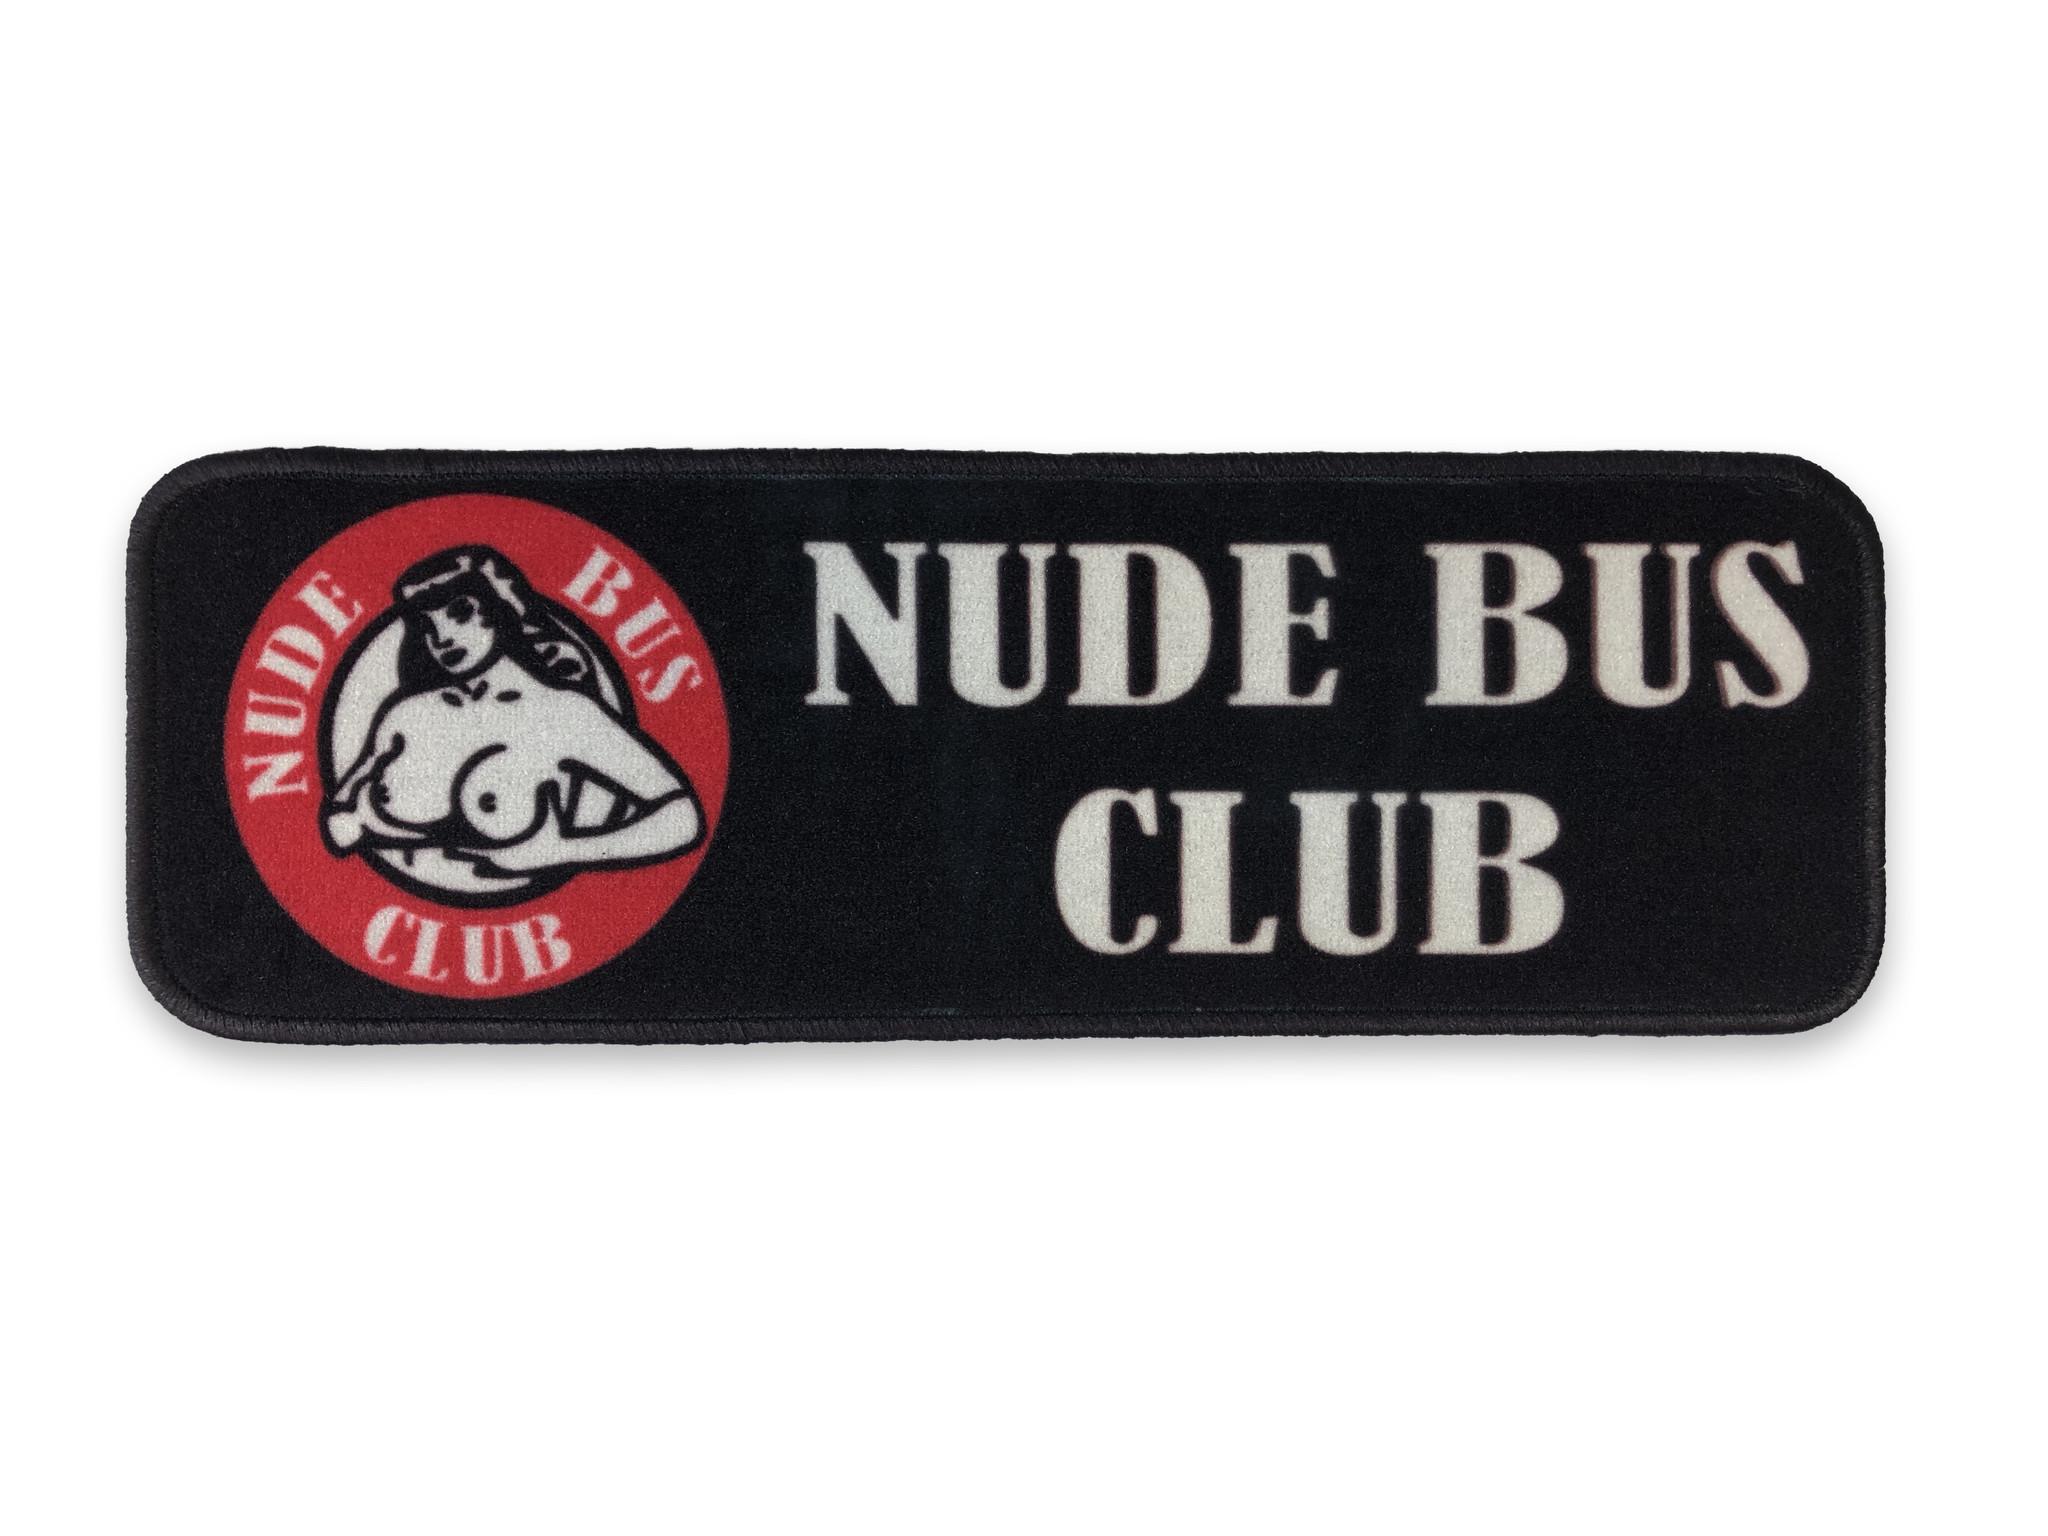 Nude bus